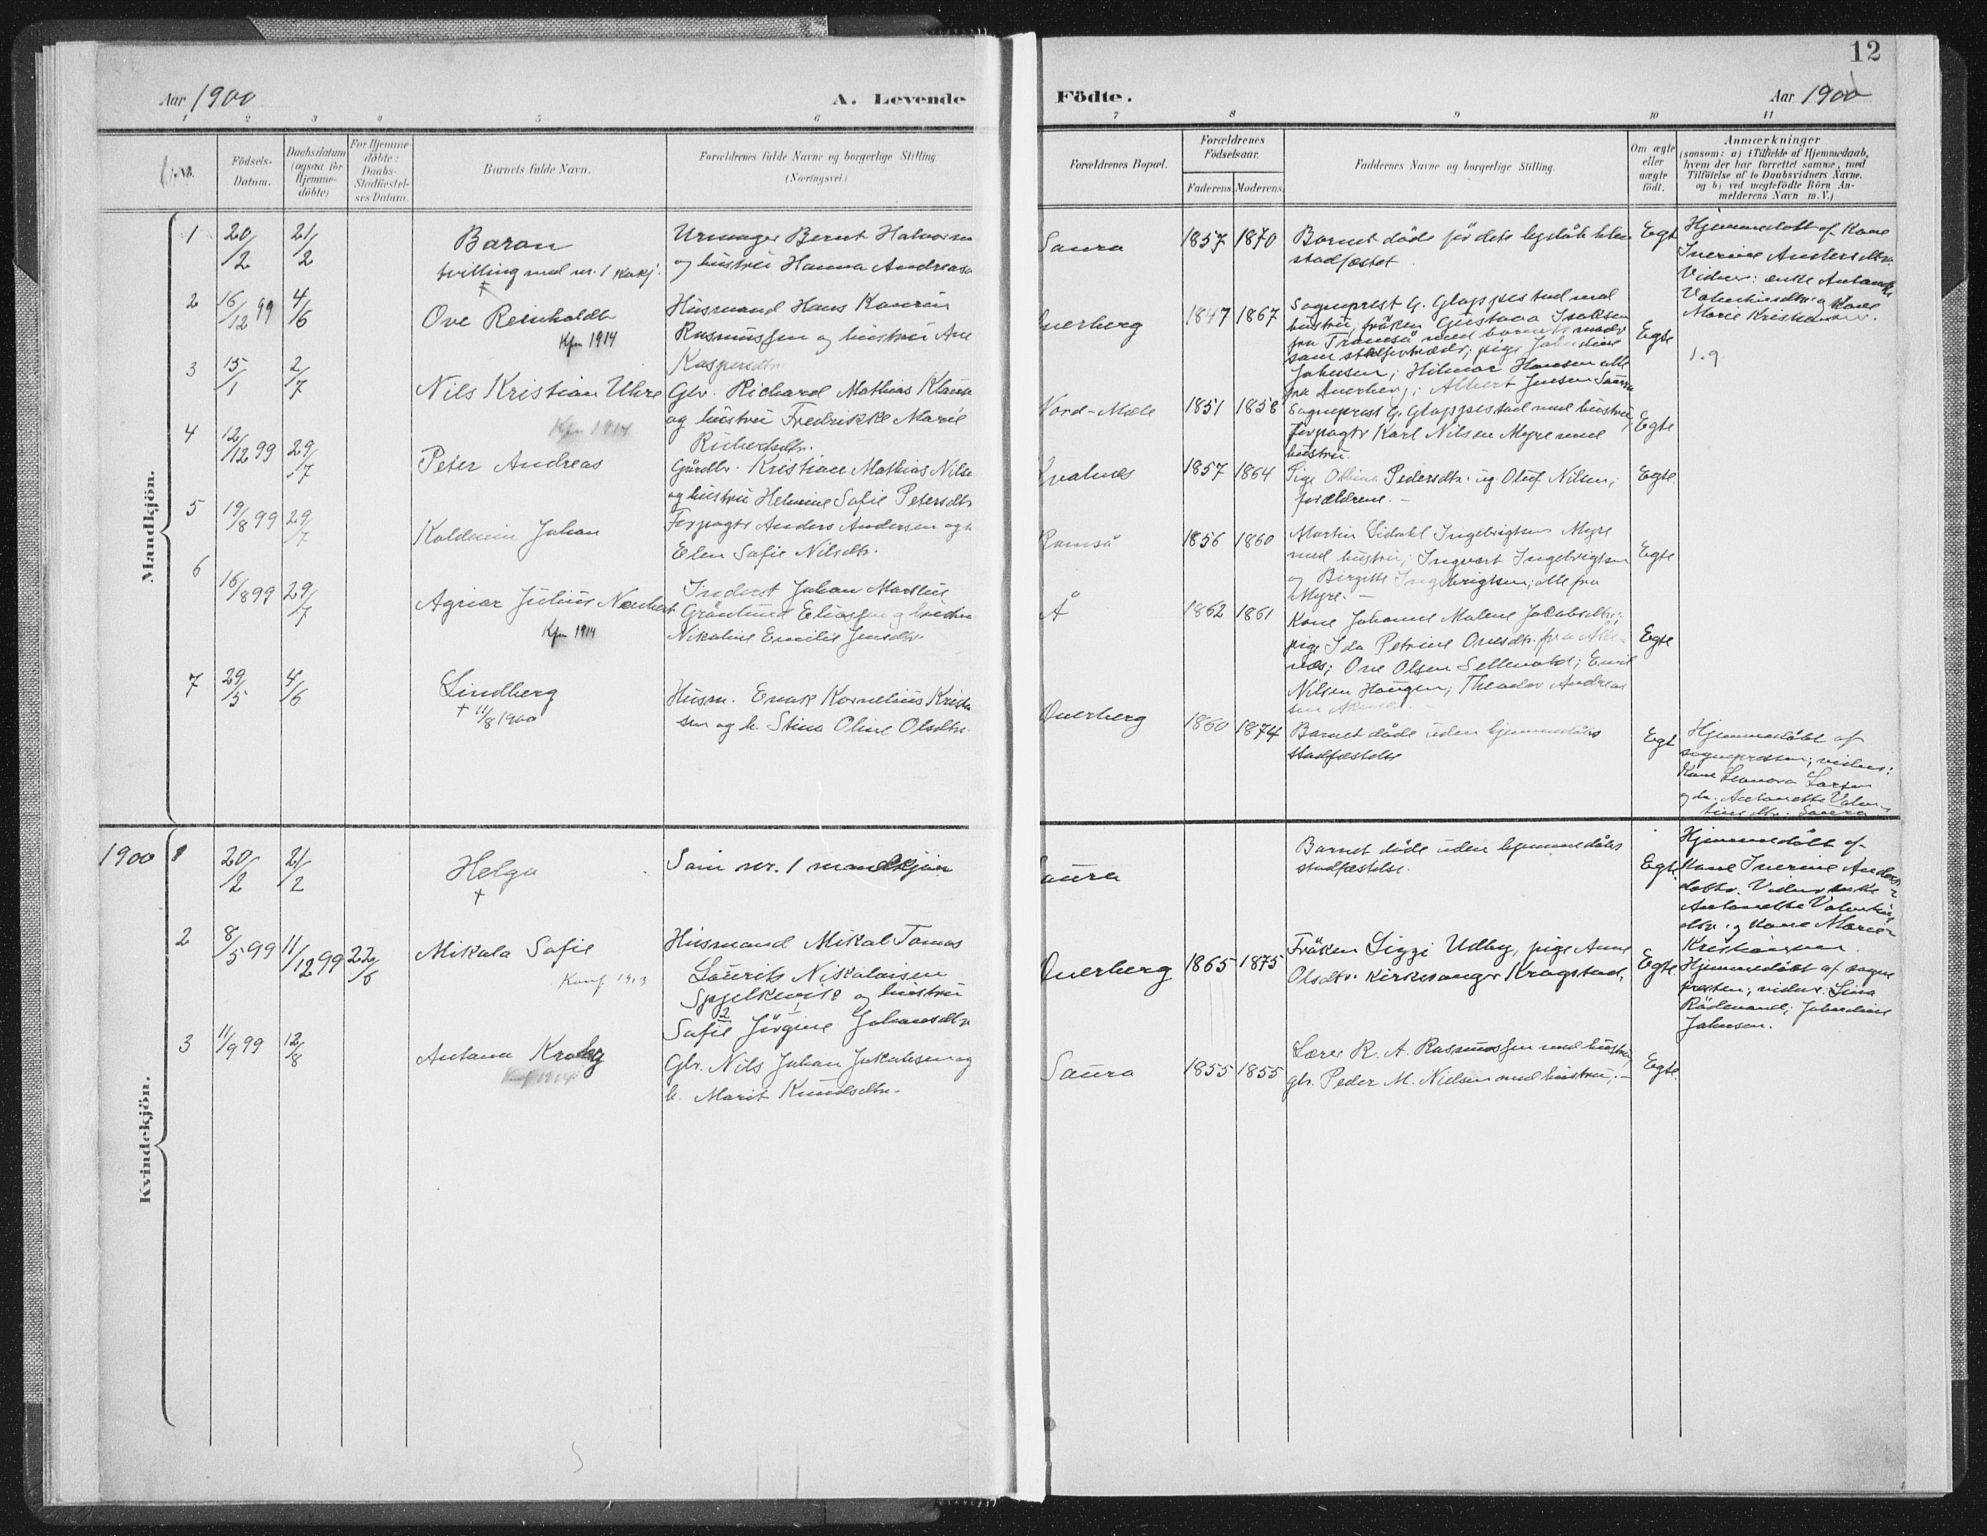 SAT, Ministerialprotokoller, klokkerbøker og fødselsregistre - Nordland, 897/L1400: Ministerialbok nr. 897A07, 1897-1908, s. 12